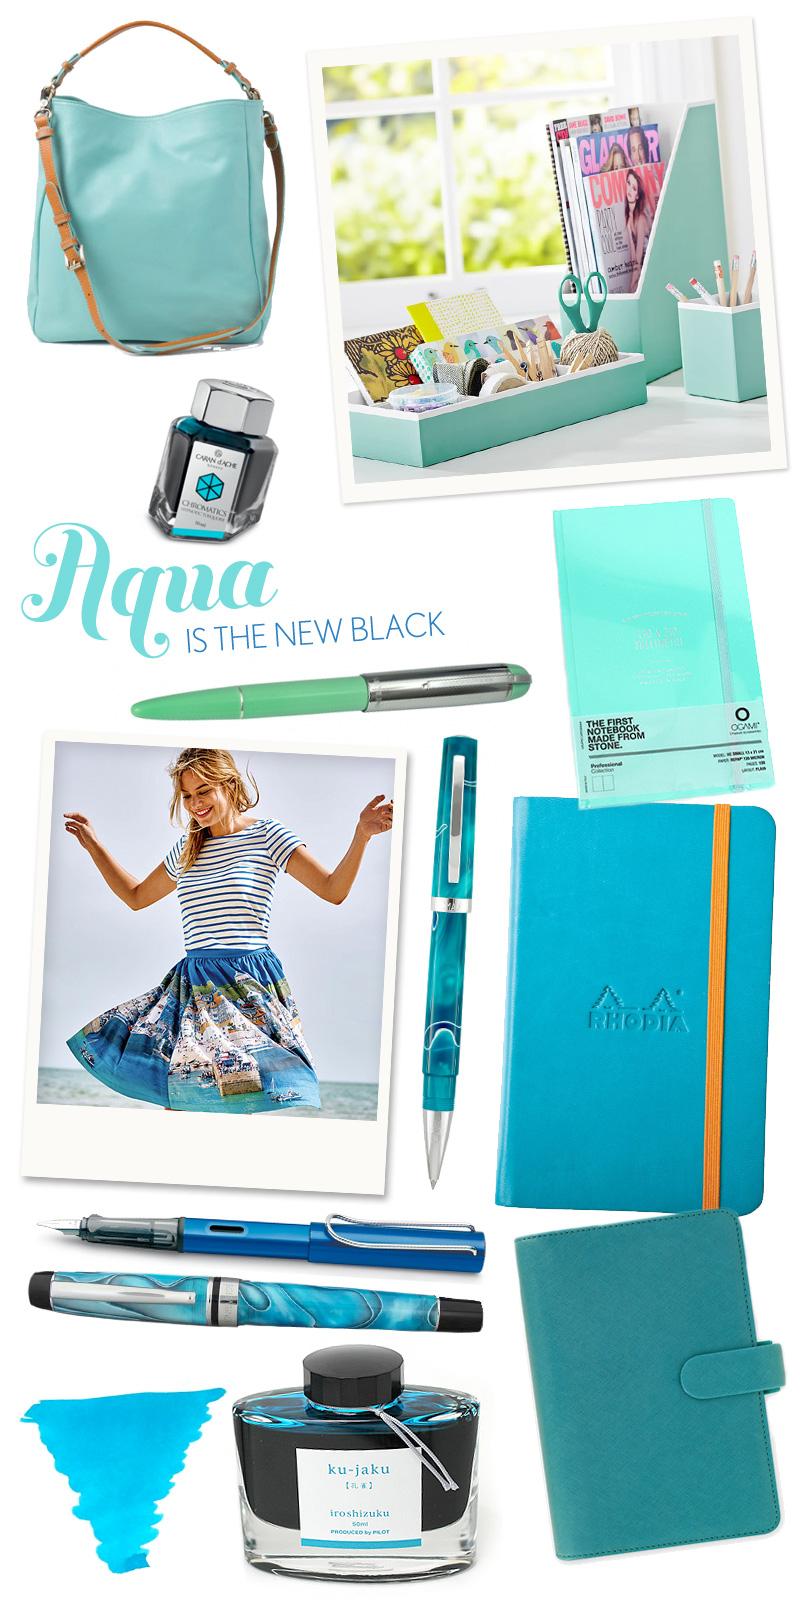 Fashionable Friday: Aqua ins the new black